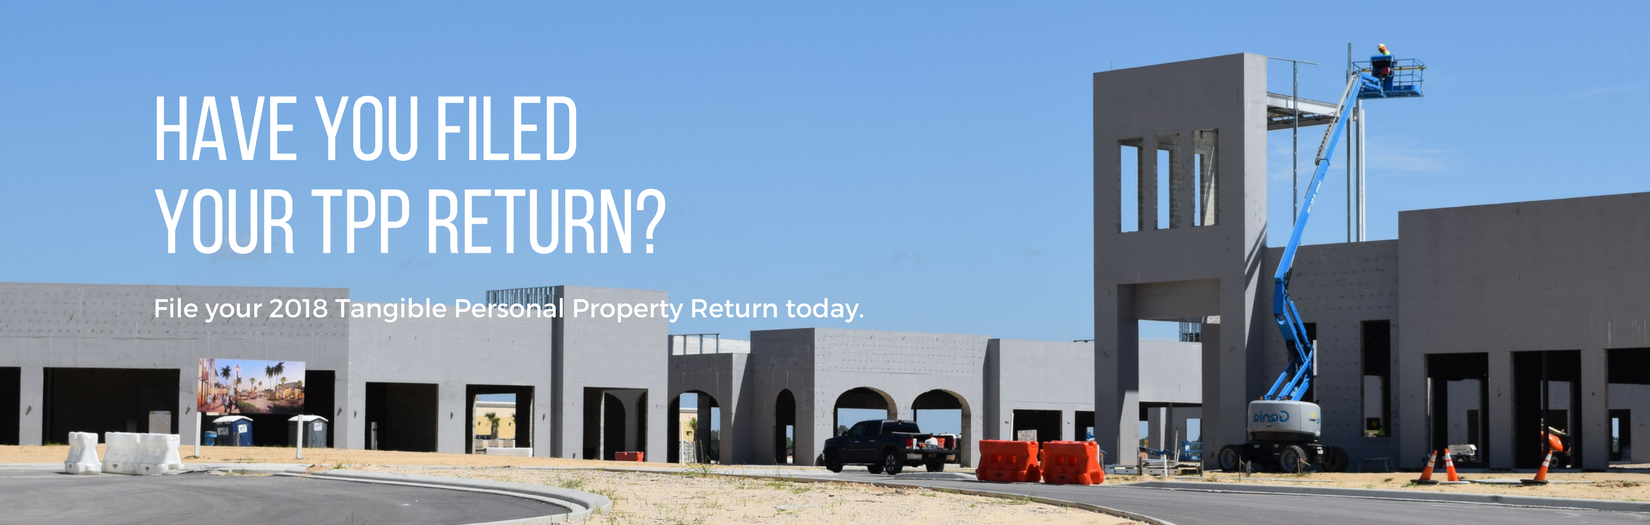 Www Property Appraiser Org